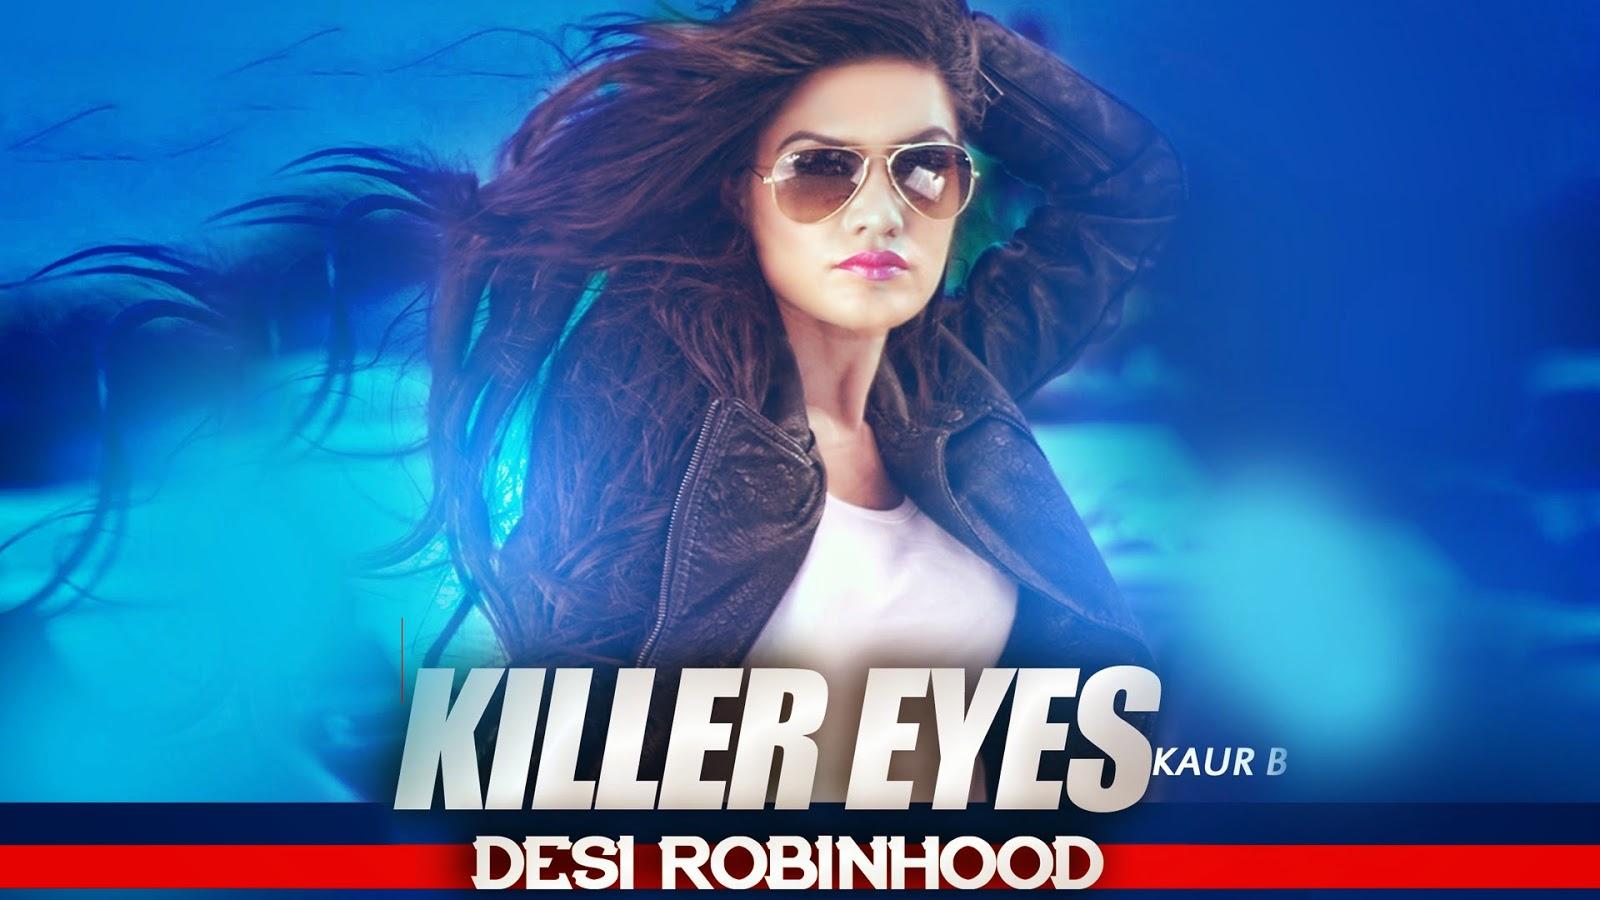 killer-eyes-mp3-download-lyrics-hd-video-kaur-B